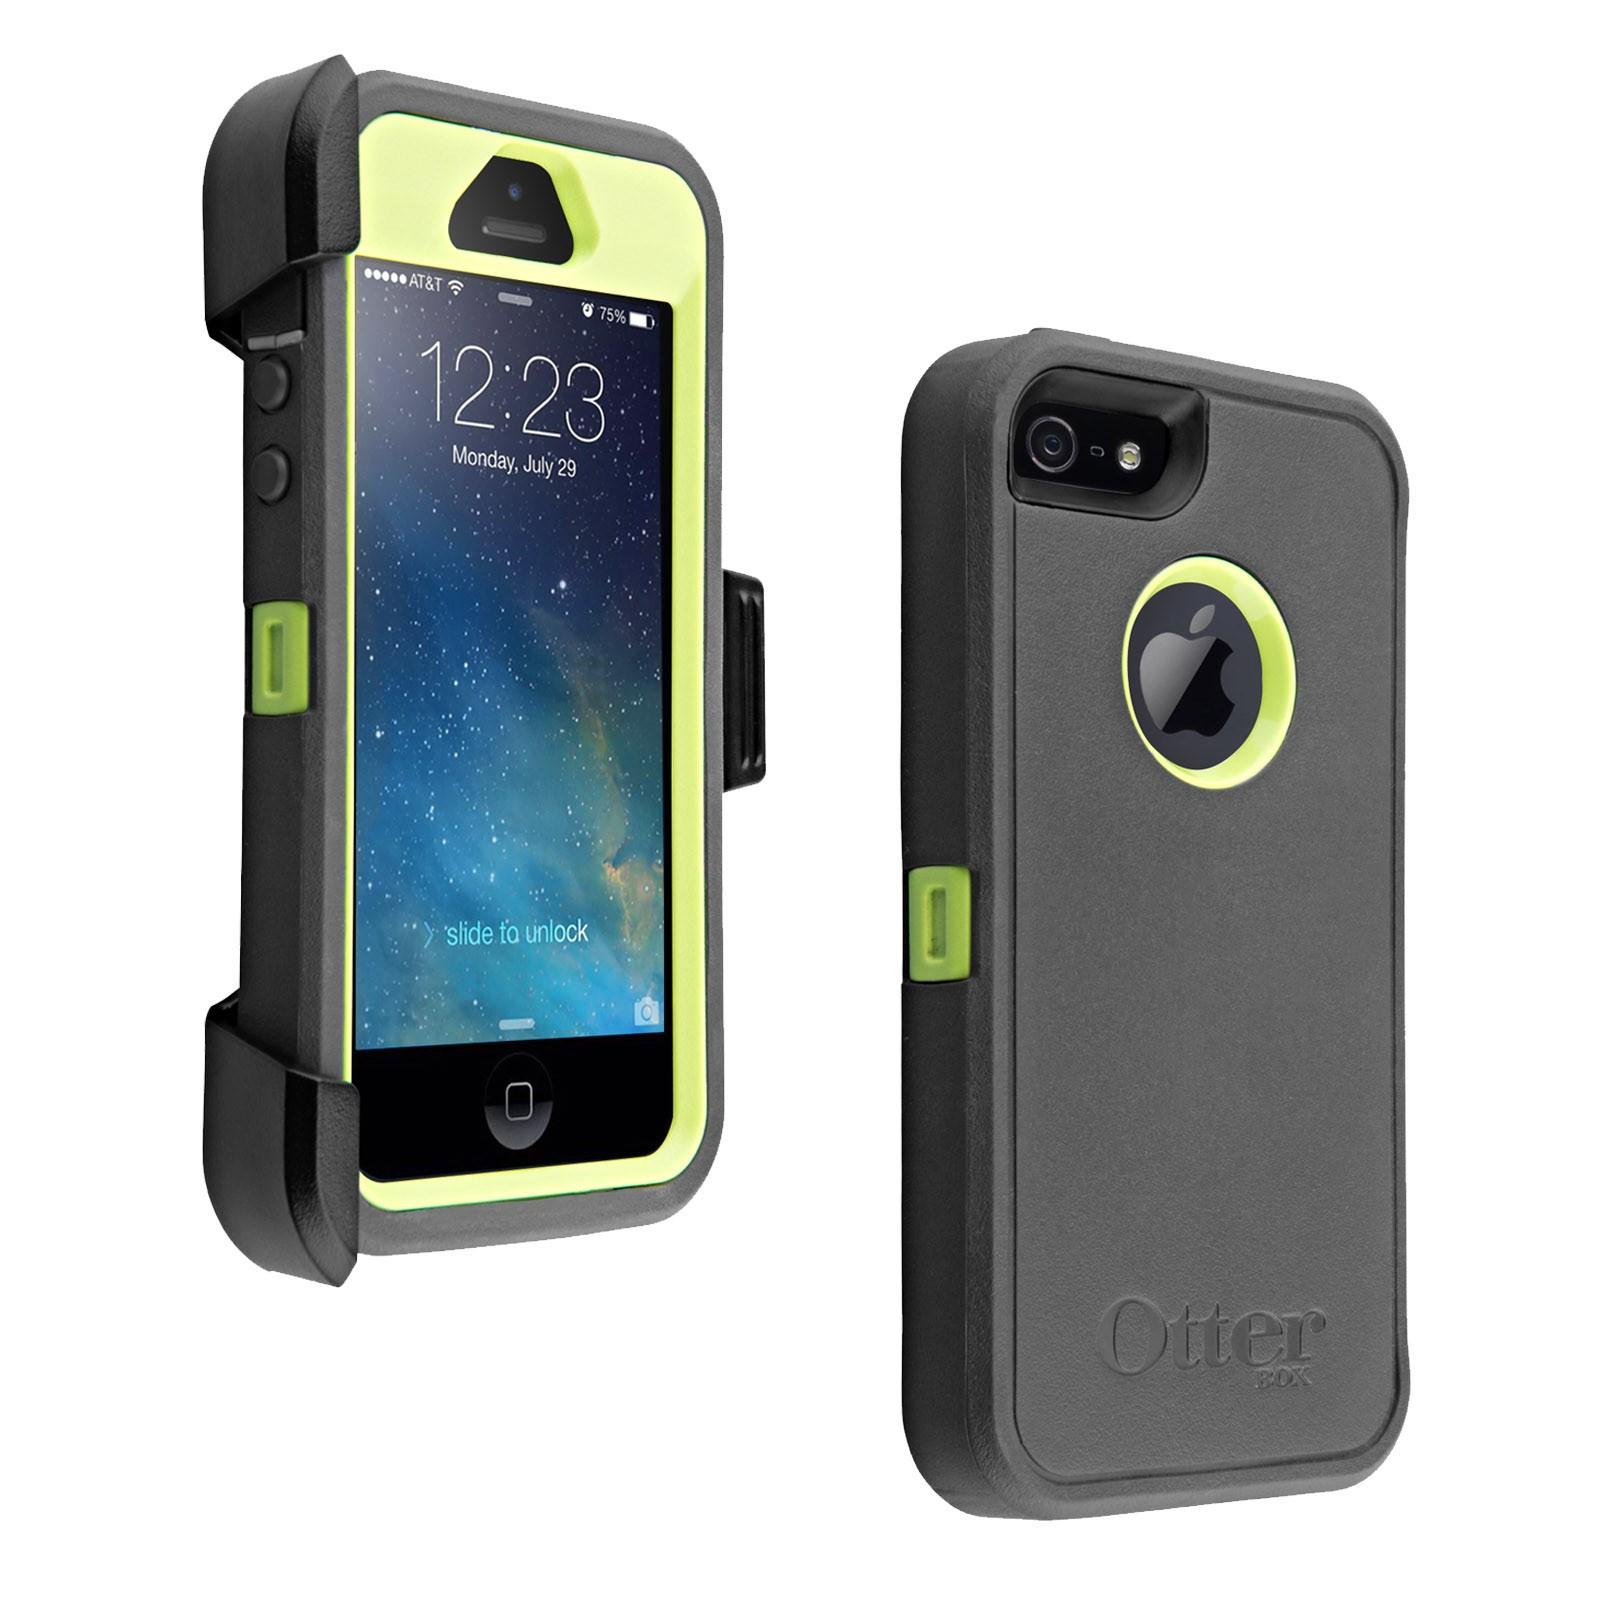 Otter box defender iphone 5